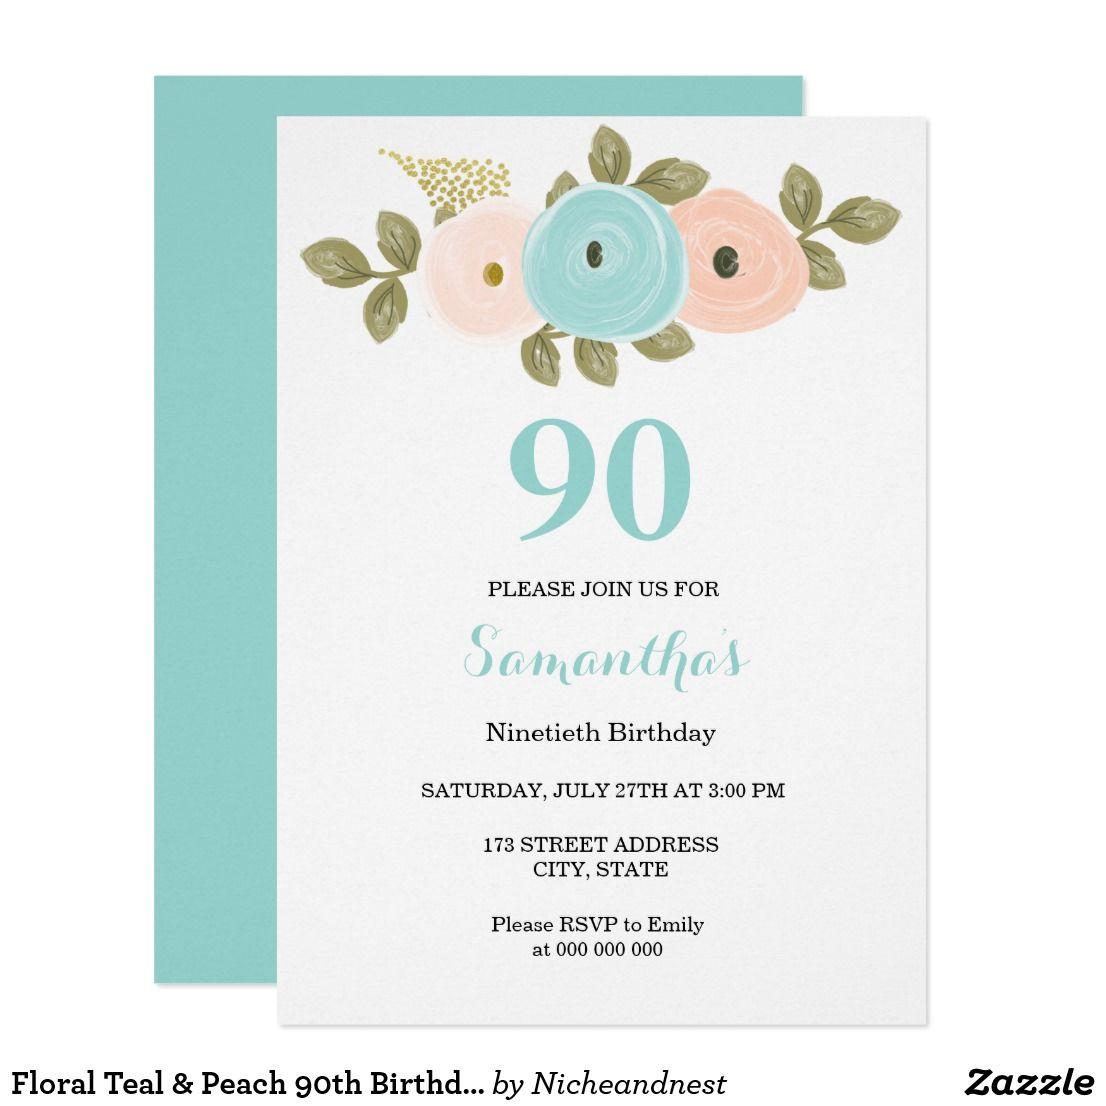 Floral Teal & Peach 90th Birthday Party Invitation   90th birthday ...